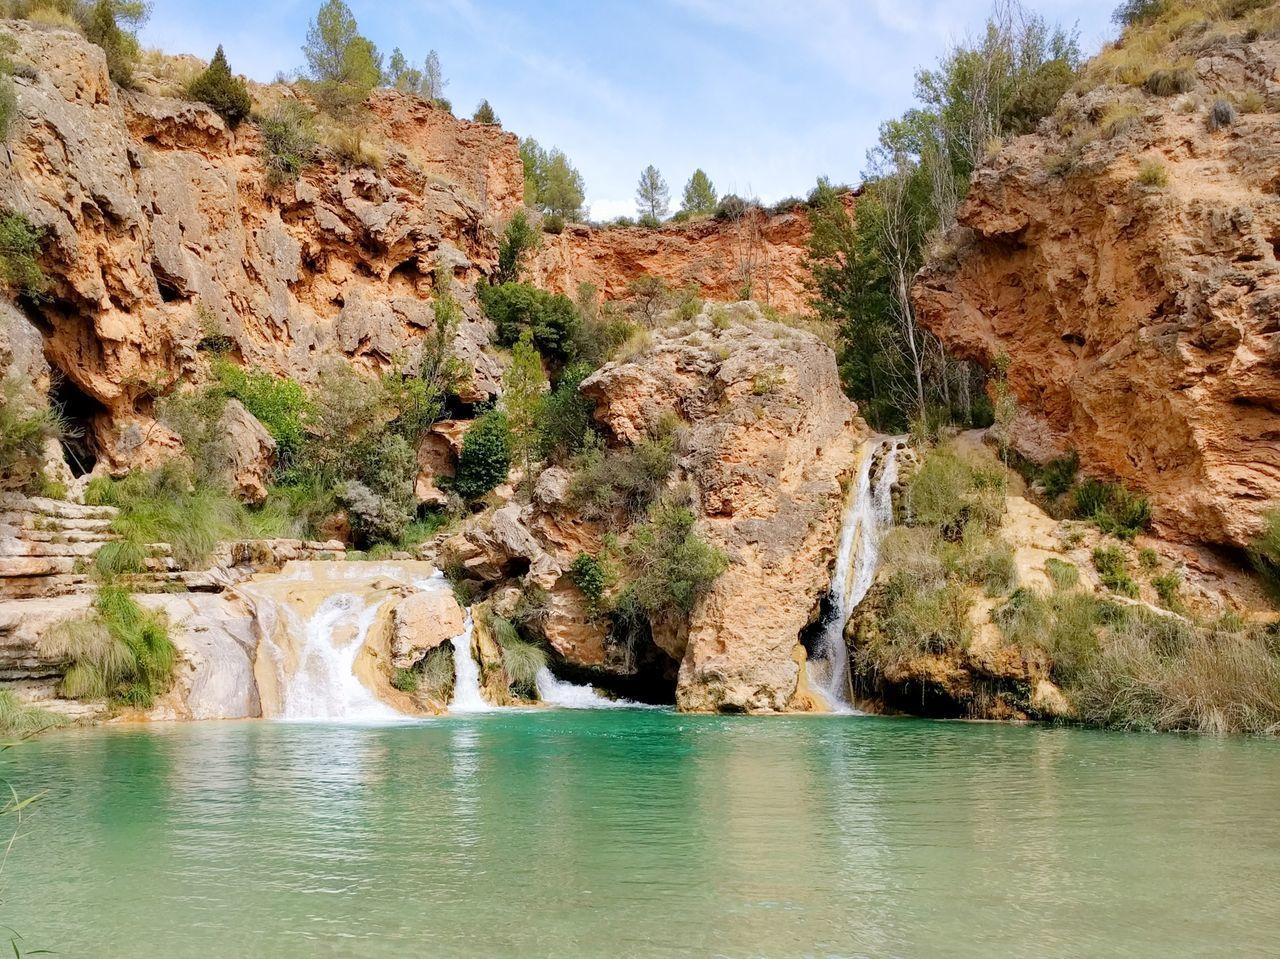 Beautiful day in Las Chorreras, Enguídanos (Spain) ⏺ Bonito día en Las Chorreras, Enguídanos (España) Las Chorreras Enguídanos SPAIN España Landscape Paisaje Water Agua Beautiful Bonito